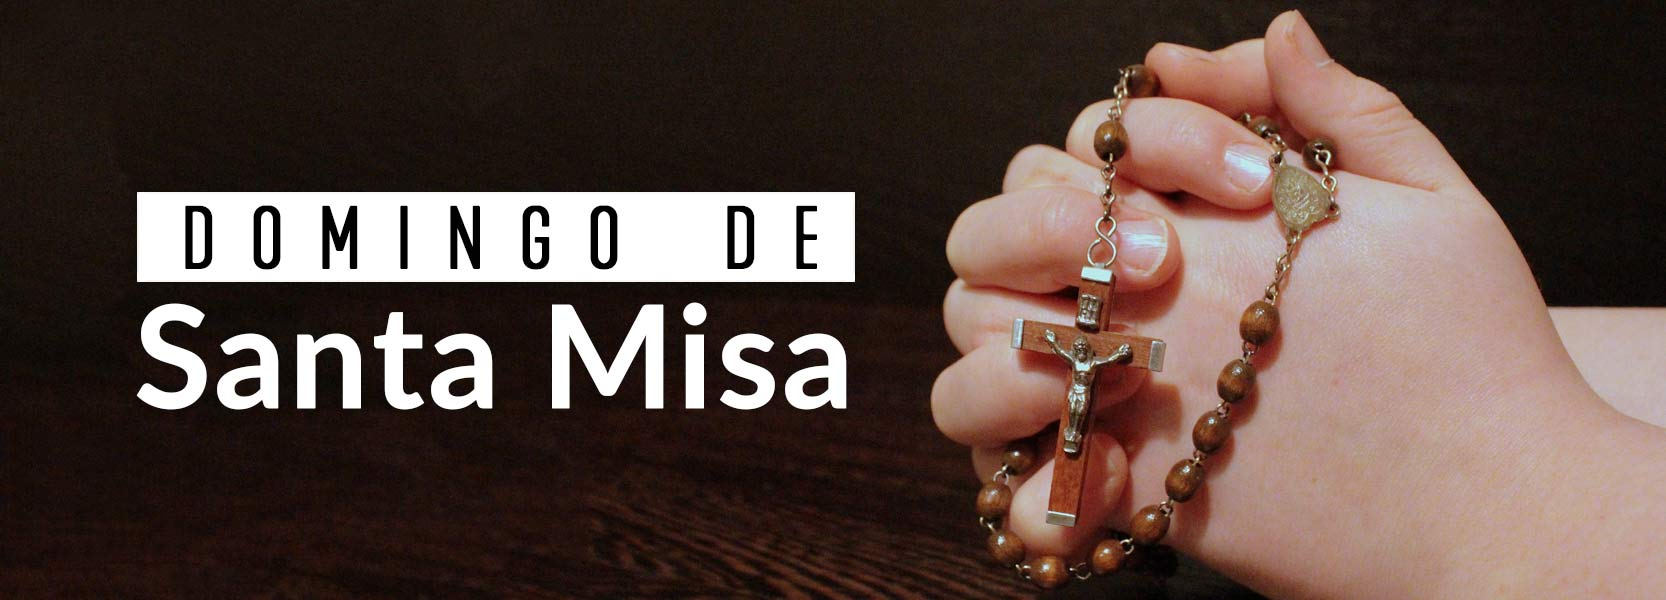 Domingo-Misa-portada